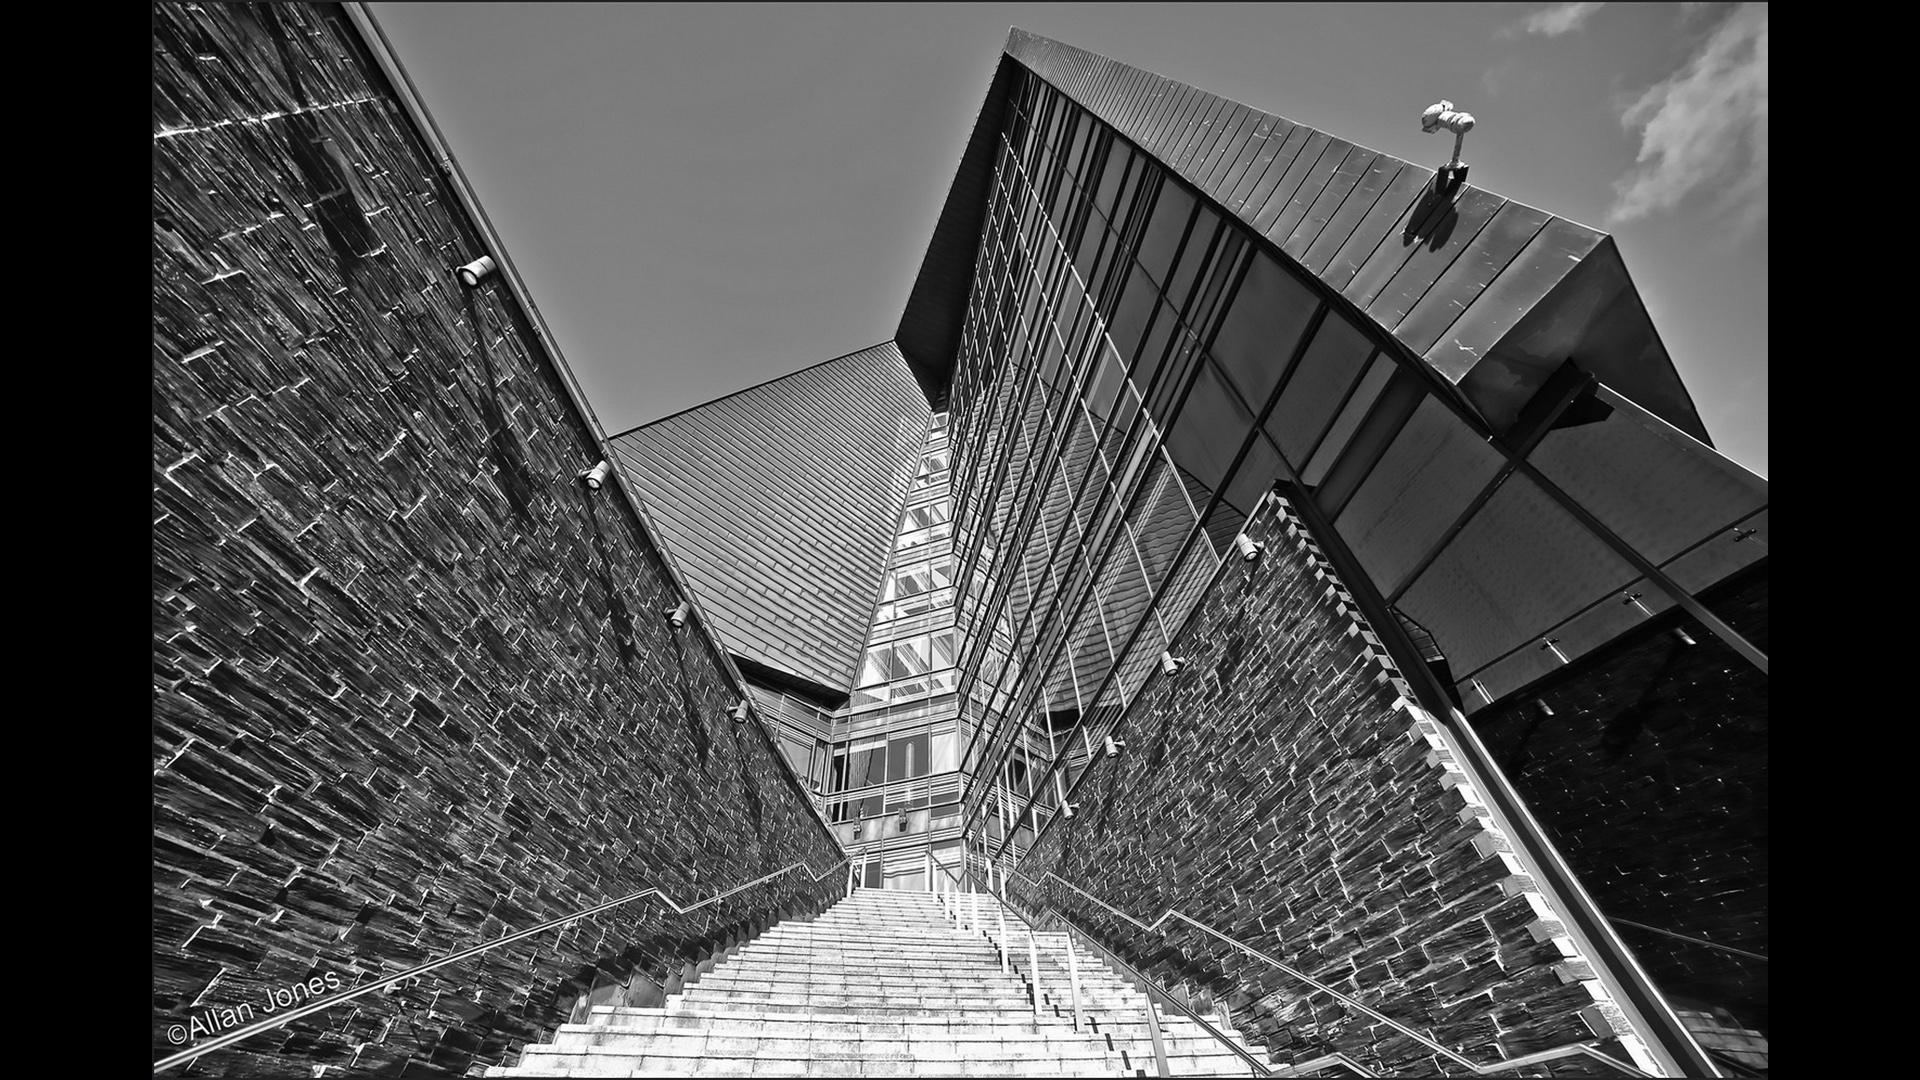 Architecture | Photographer: Allan JonesCurator: Steven Inglima